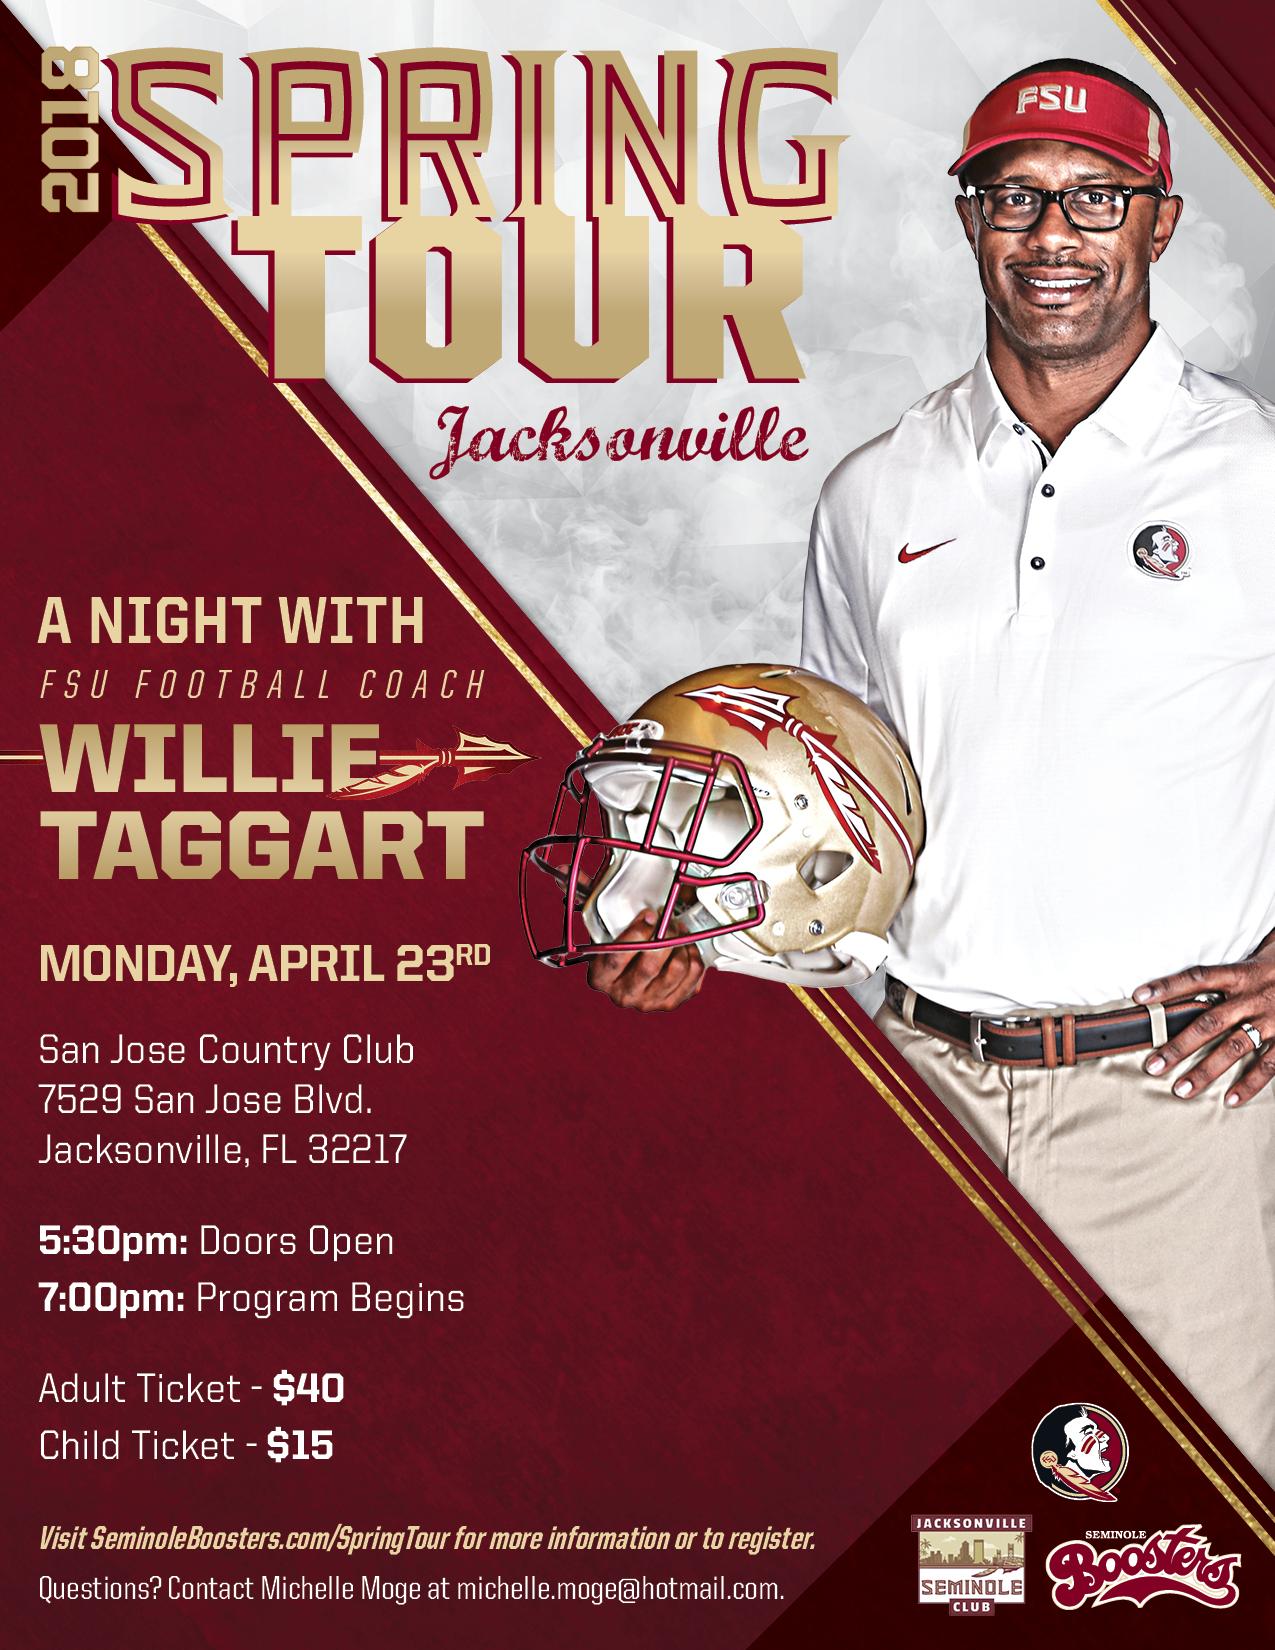 Jacksonville Spring Tour Stop